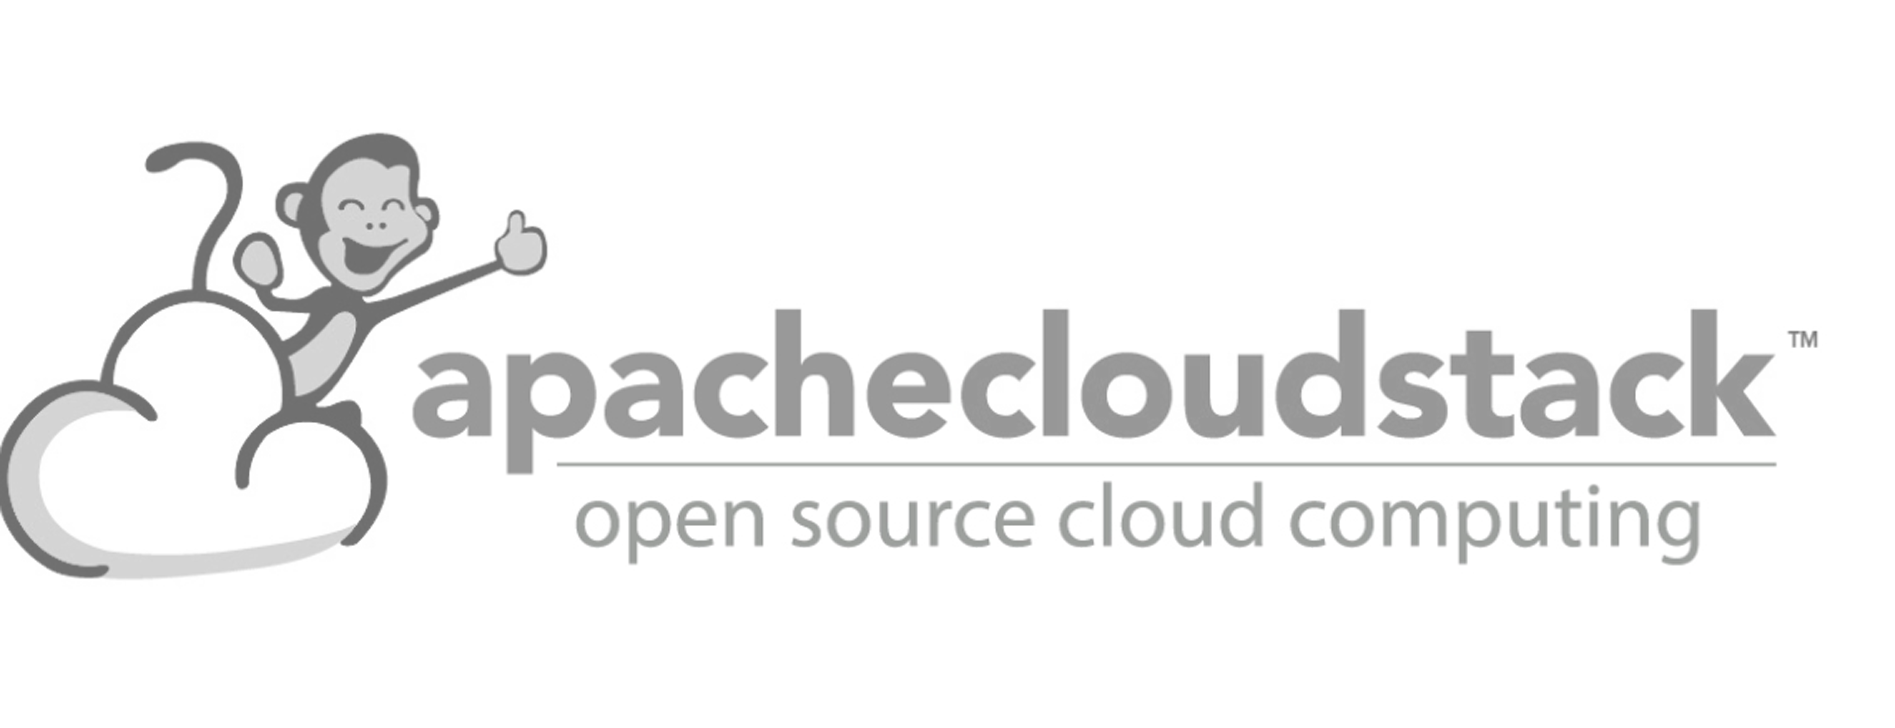 apache cloud stack